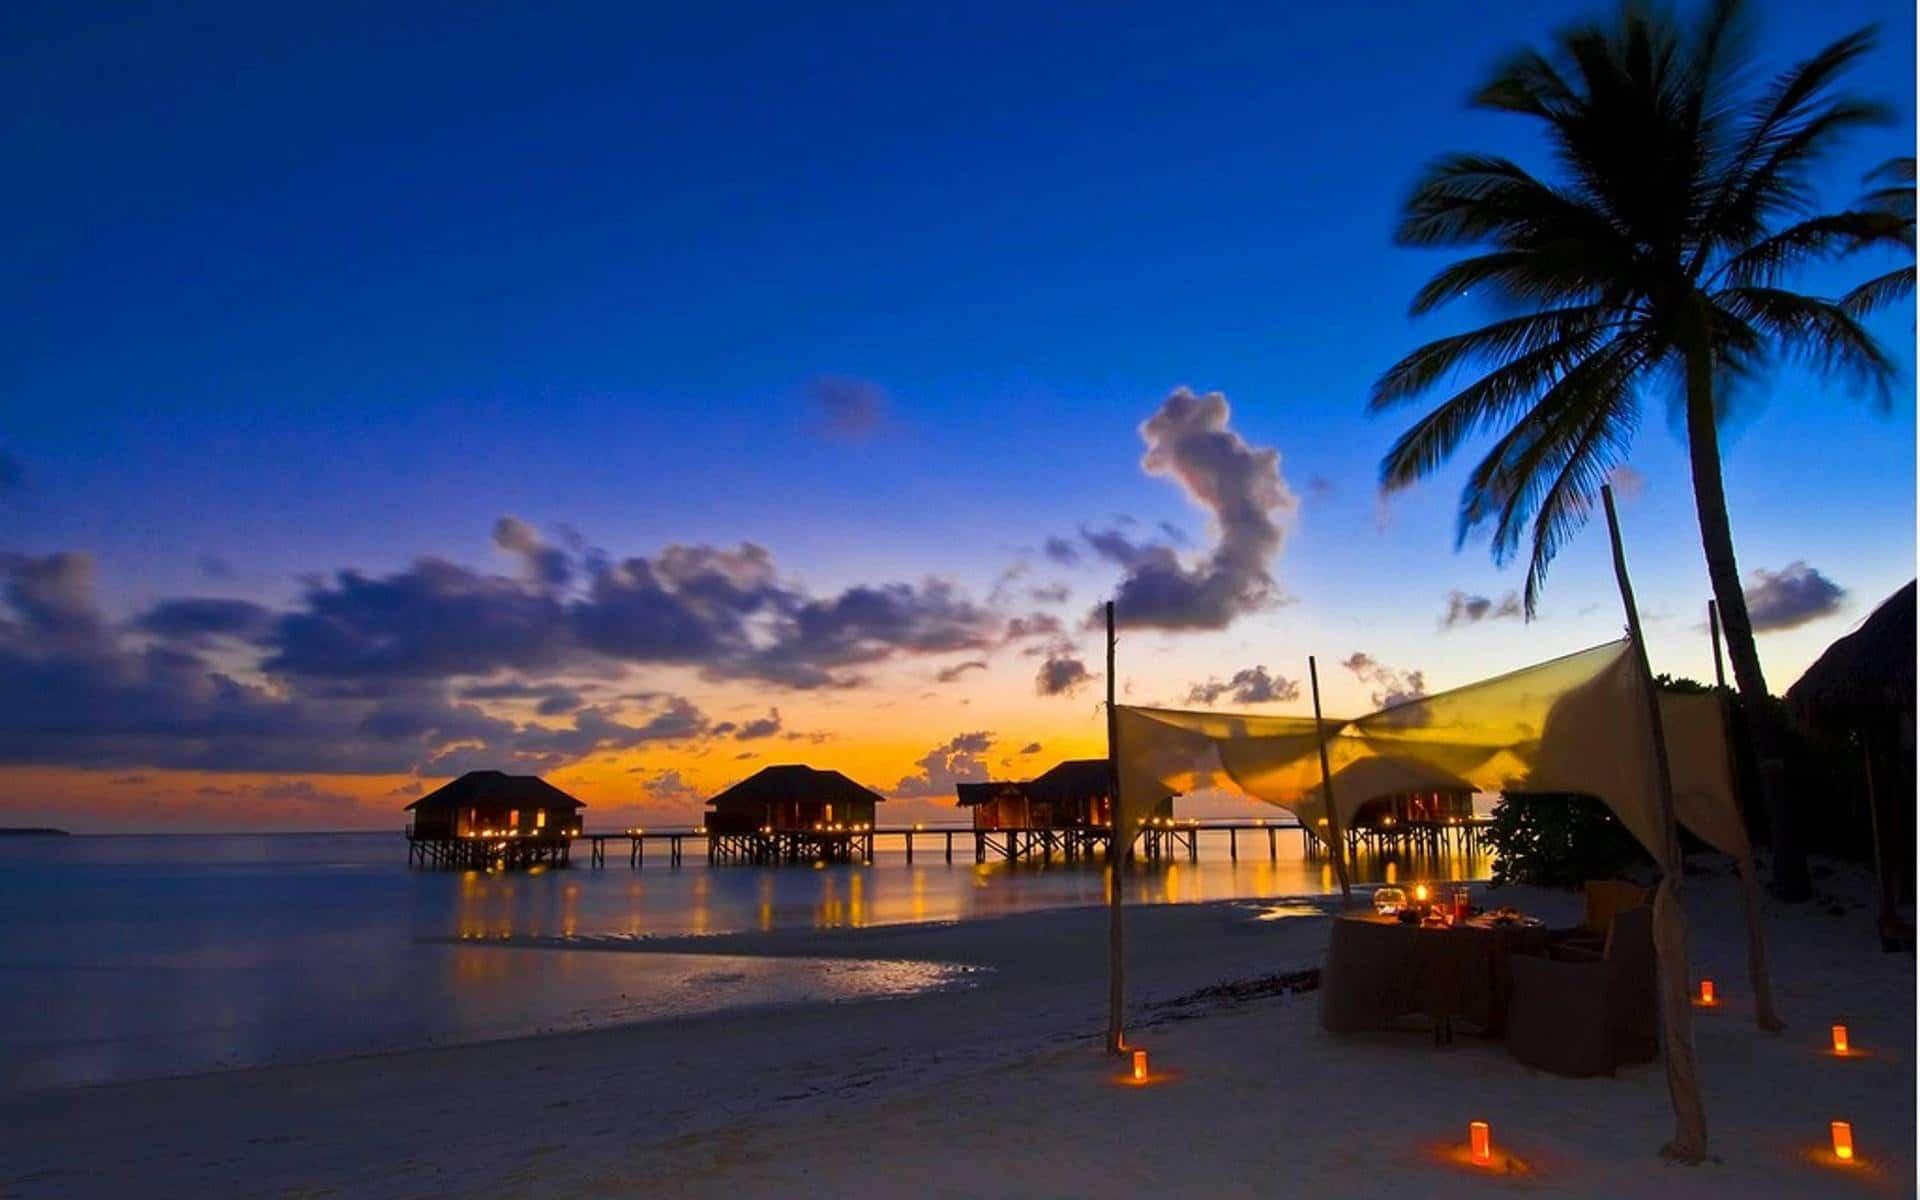 16 Luxury Pubg Wallpaper Iphone 6: جزر المالديف